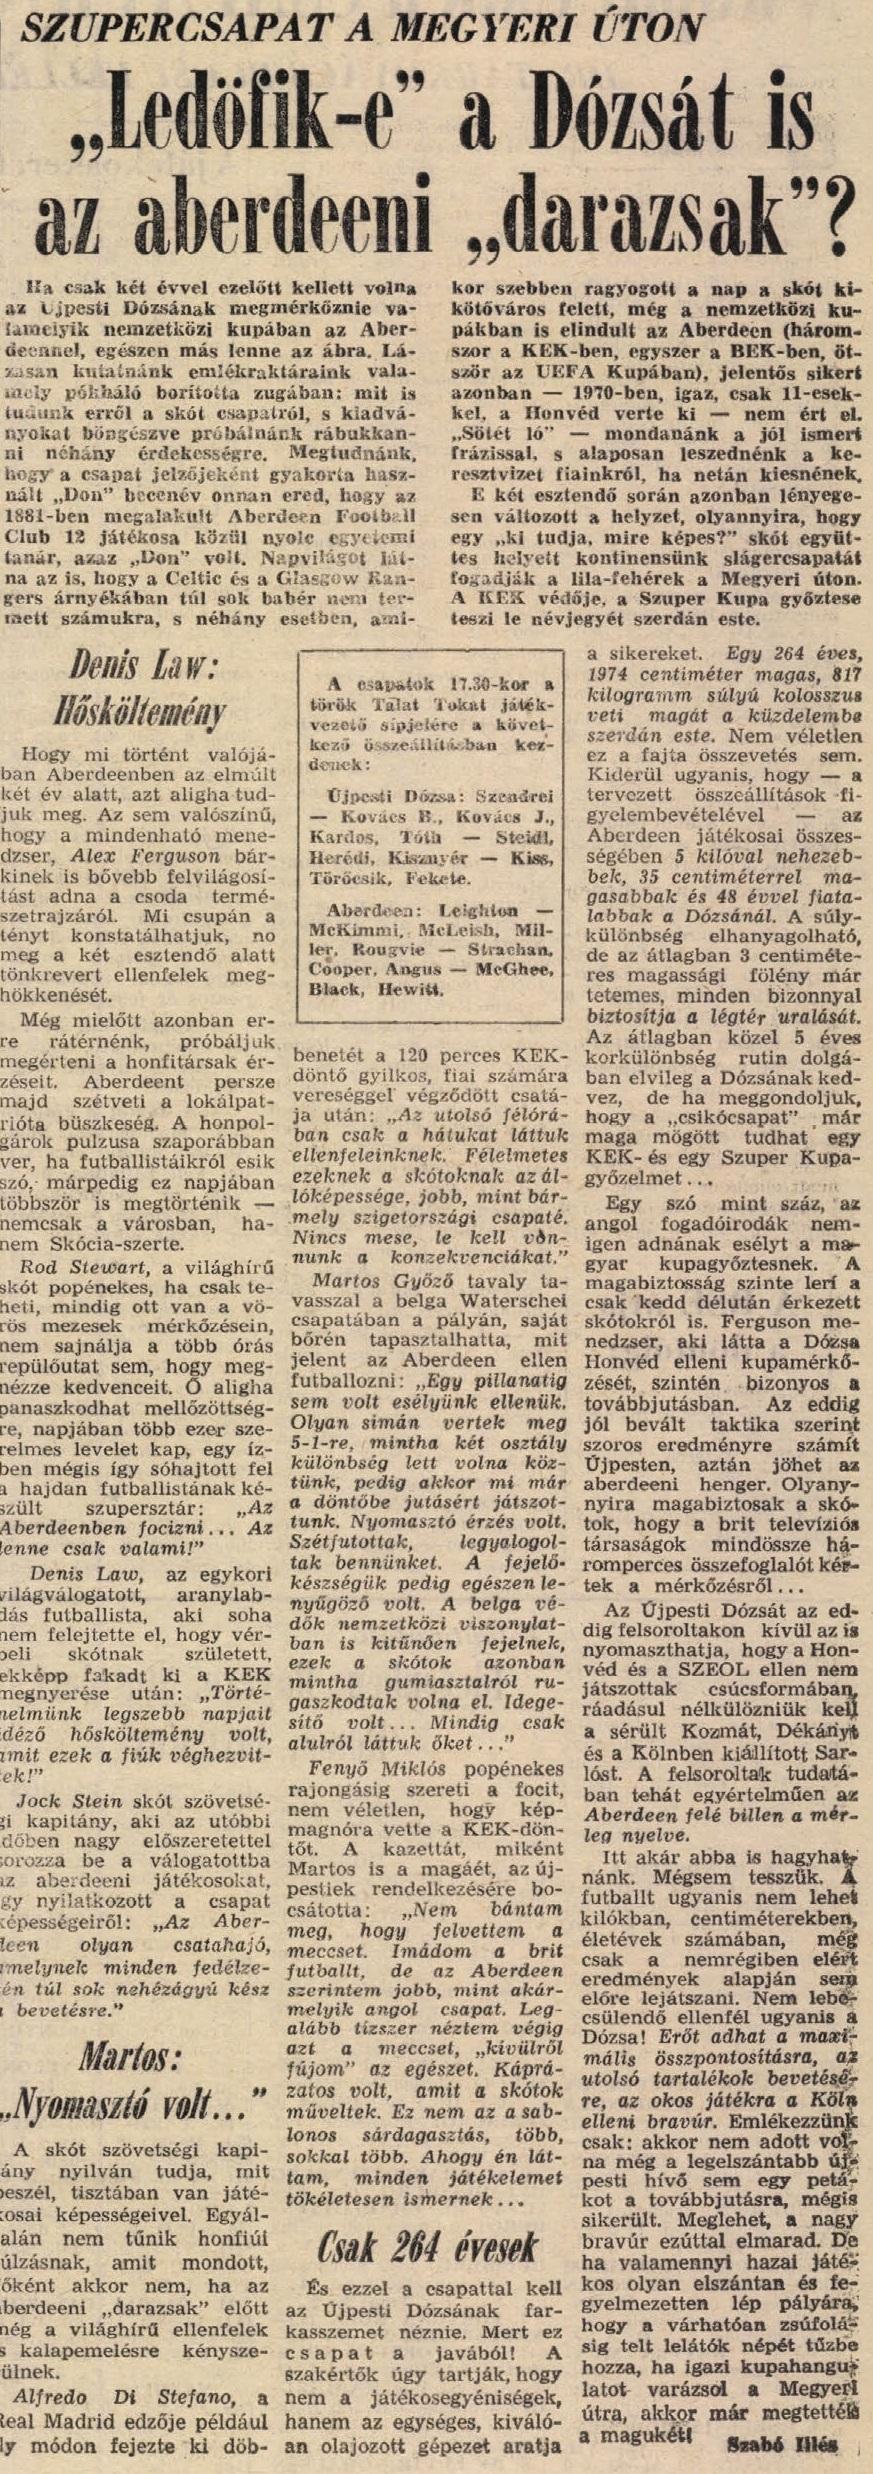 idokapszula_nb_i_1983_84_klubcsapataink_nemzetkozi_kupaszereplese_3_fordulo_1_kor_aberdeen_5.jpg